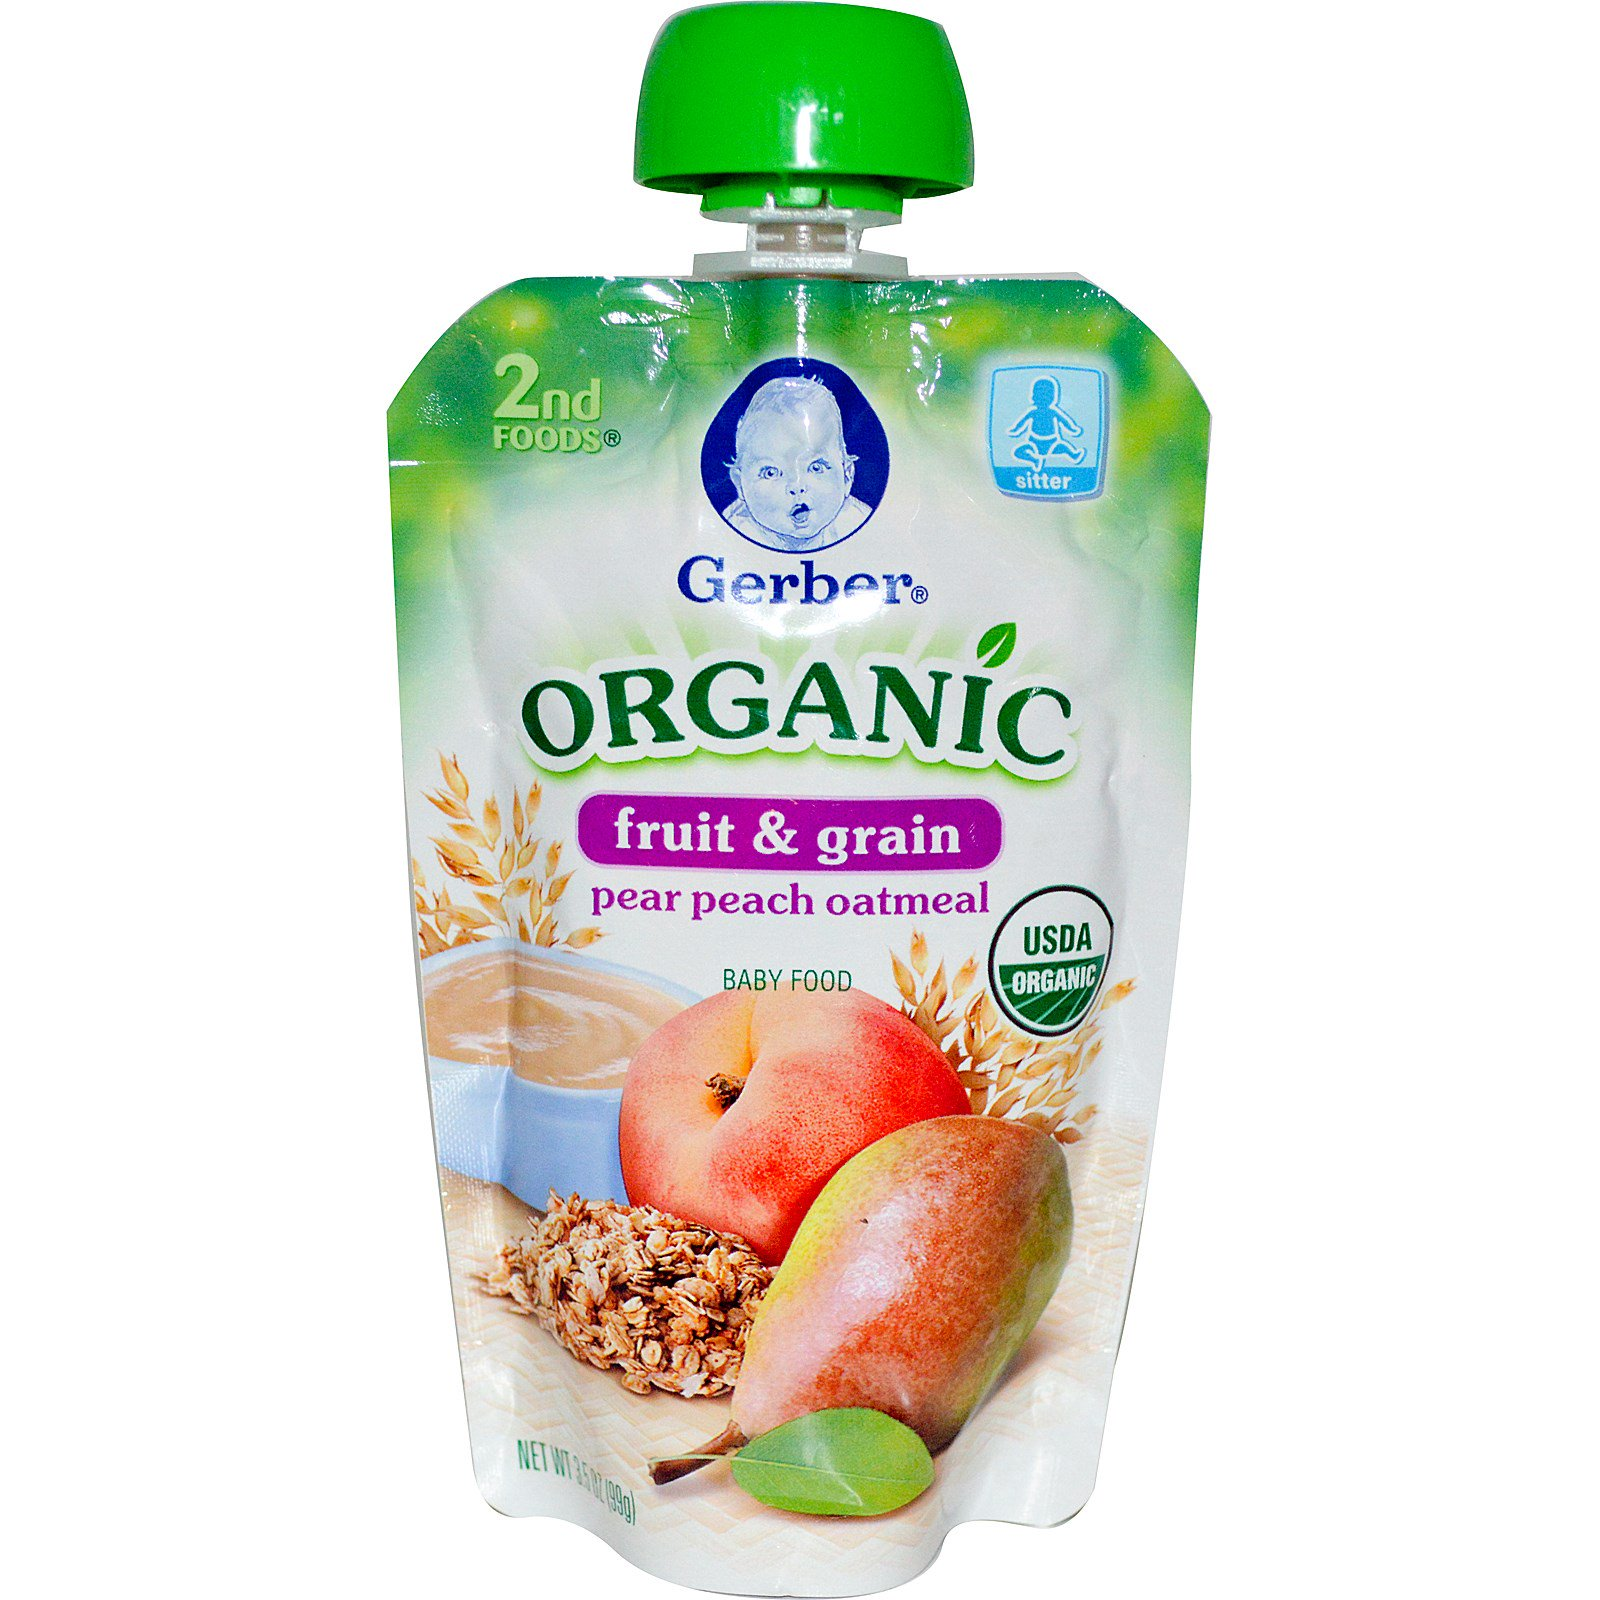 Gerber, 2nd Foods, Organic Baby Food, Fruit & Grain, Pear Peach Oatmeal, 3.5 oz (99 g) - iHerb.com